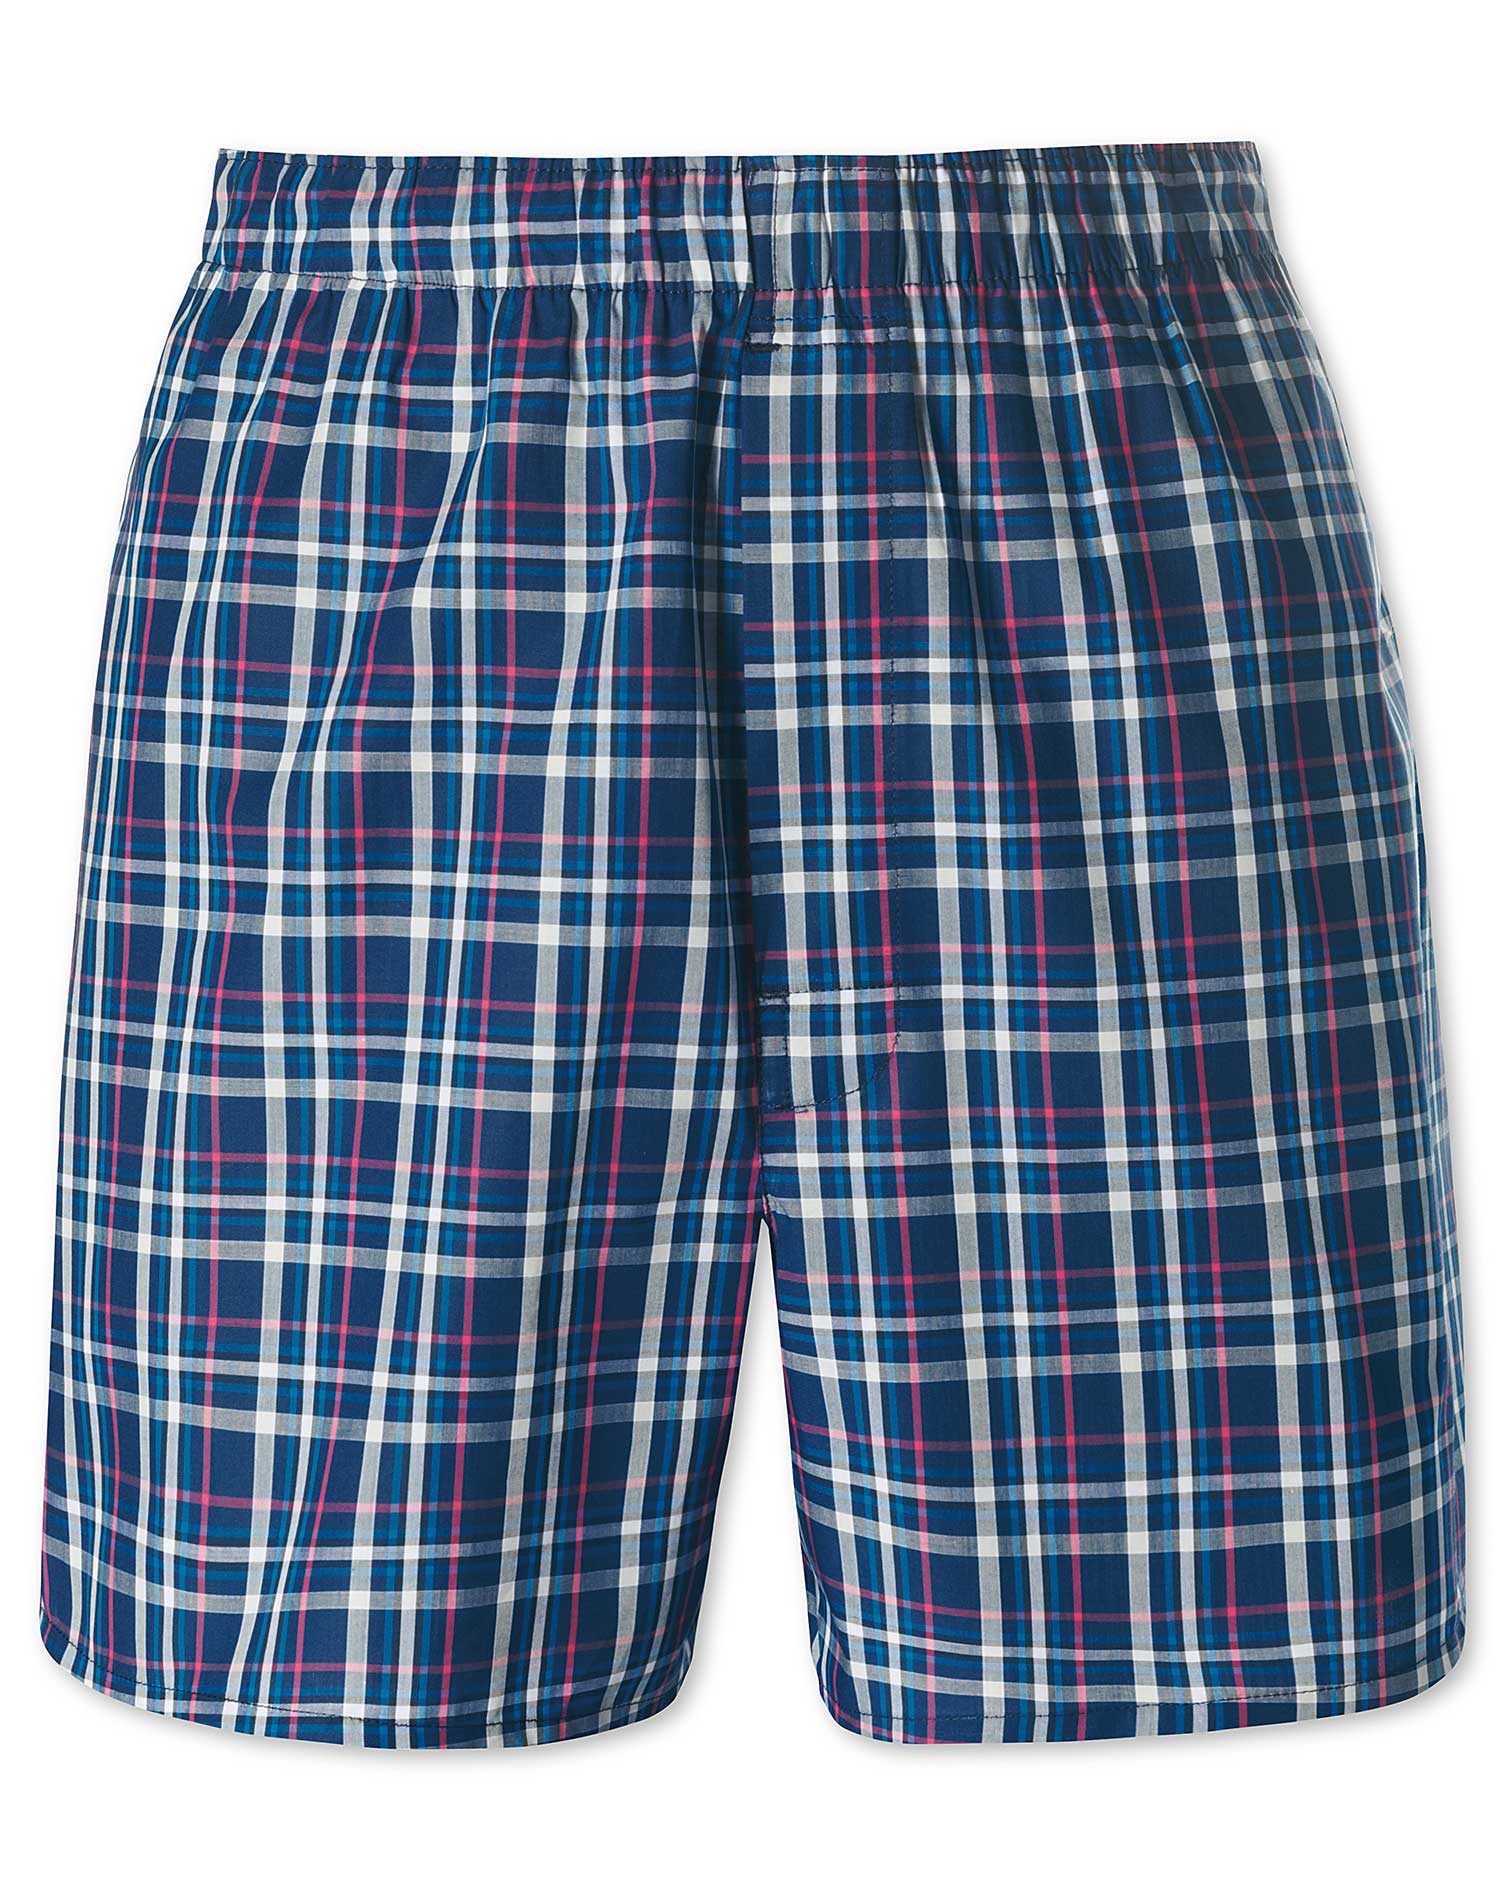 Royal Tartan Woven Boxers Size XL by Charles Tyrwhitt